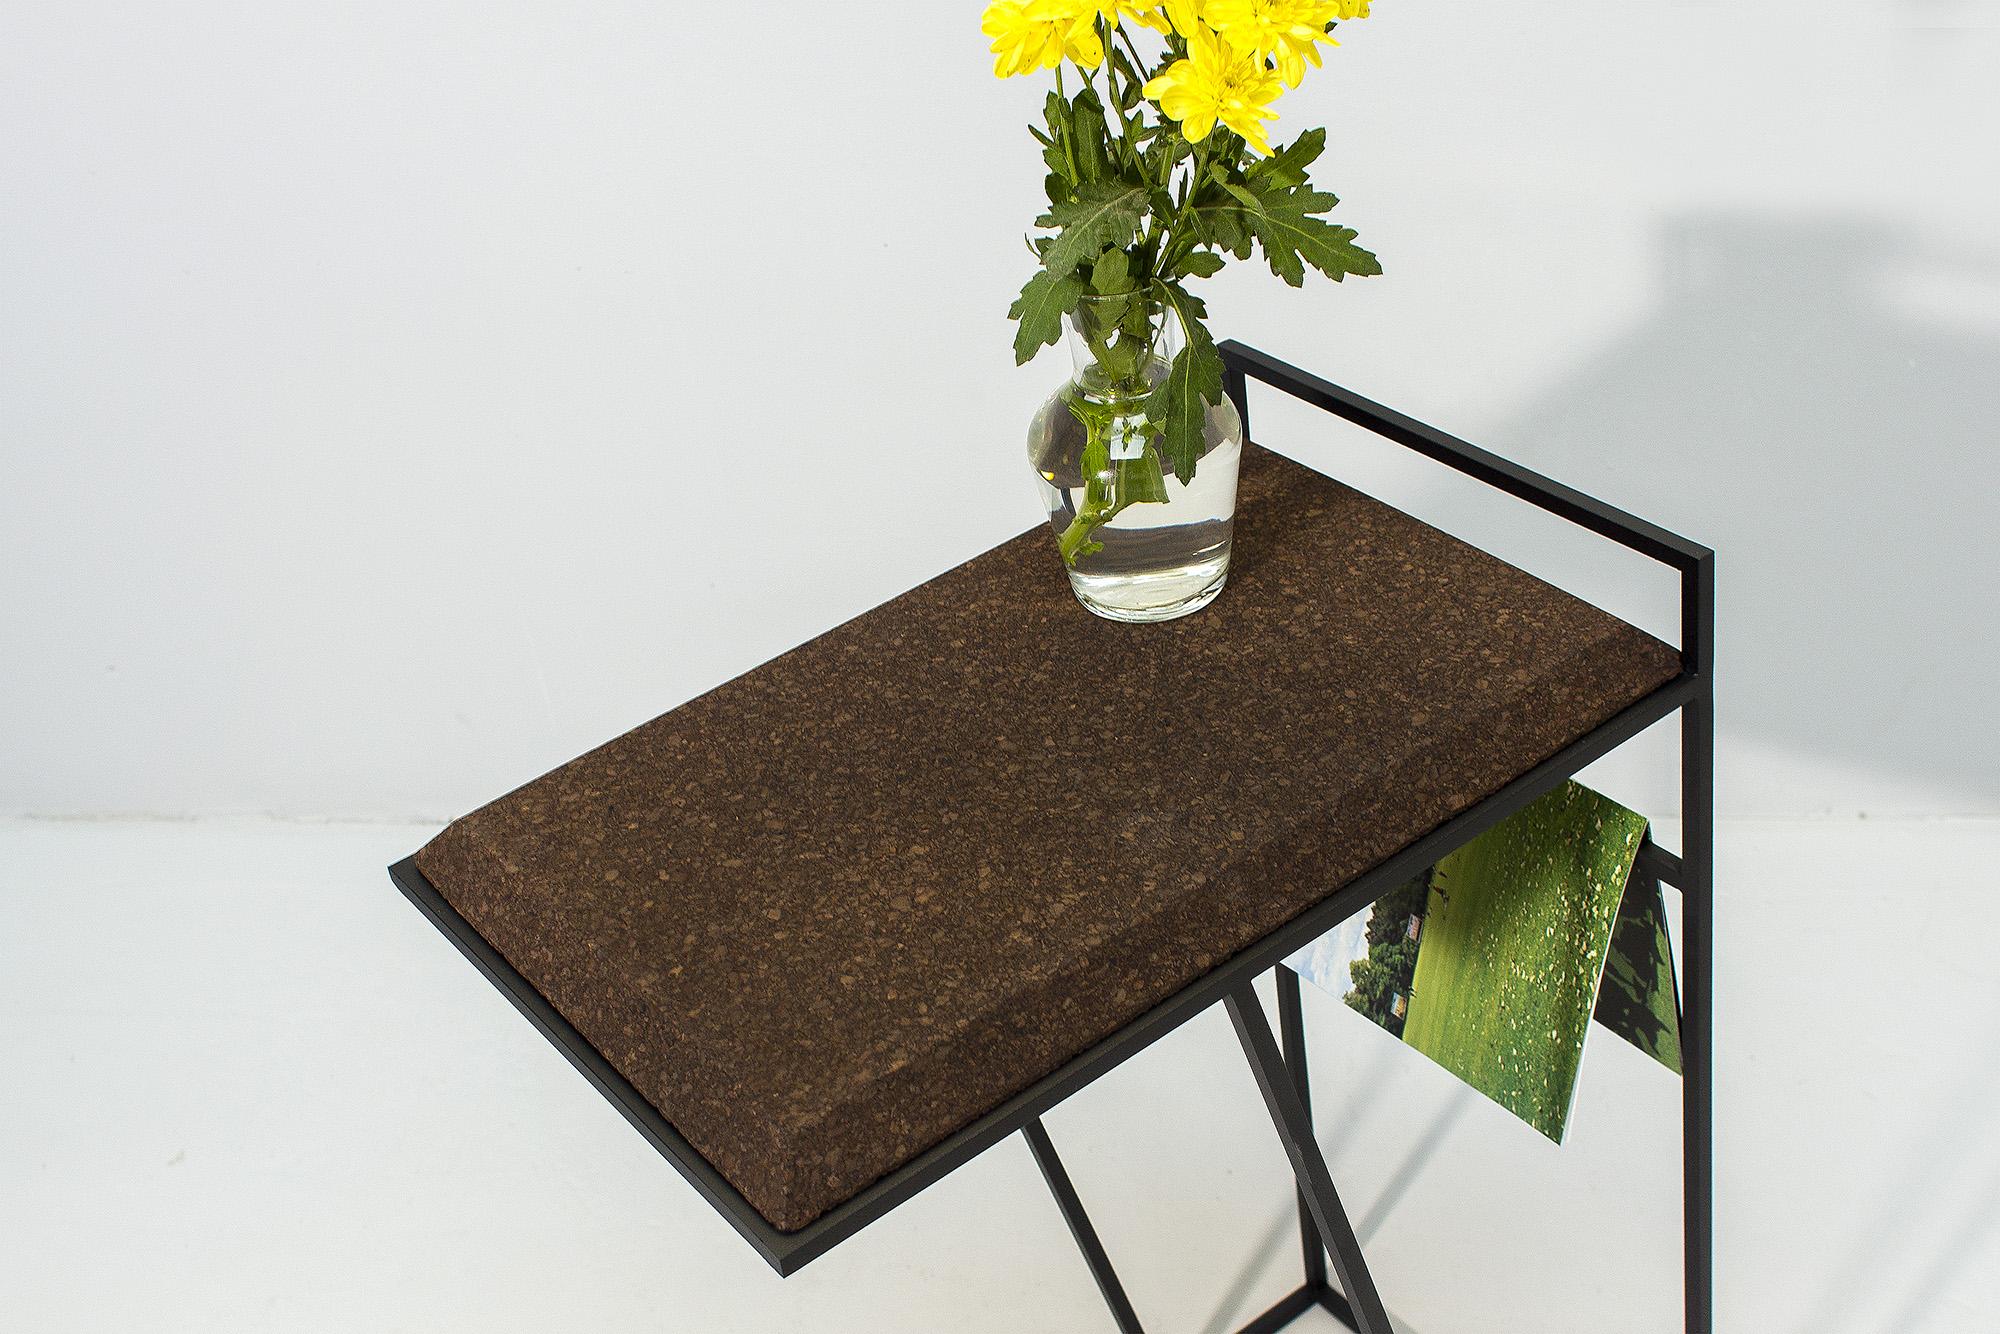 low-Galula-Grão-side-table-3-dark-cork-black-13.jpg